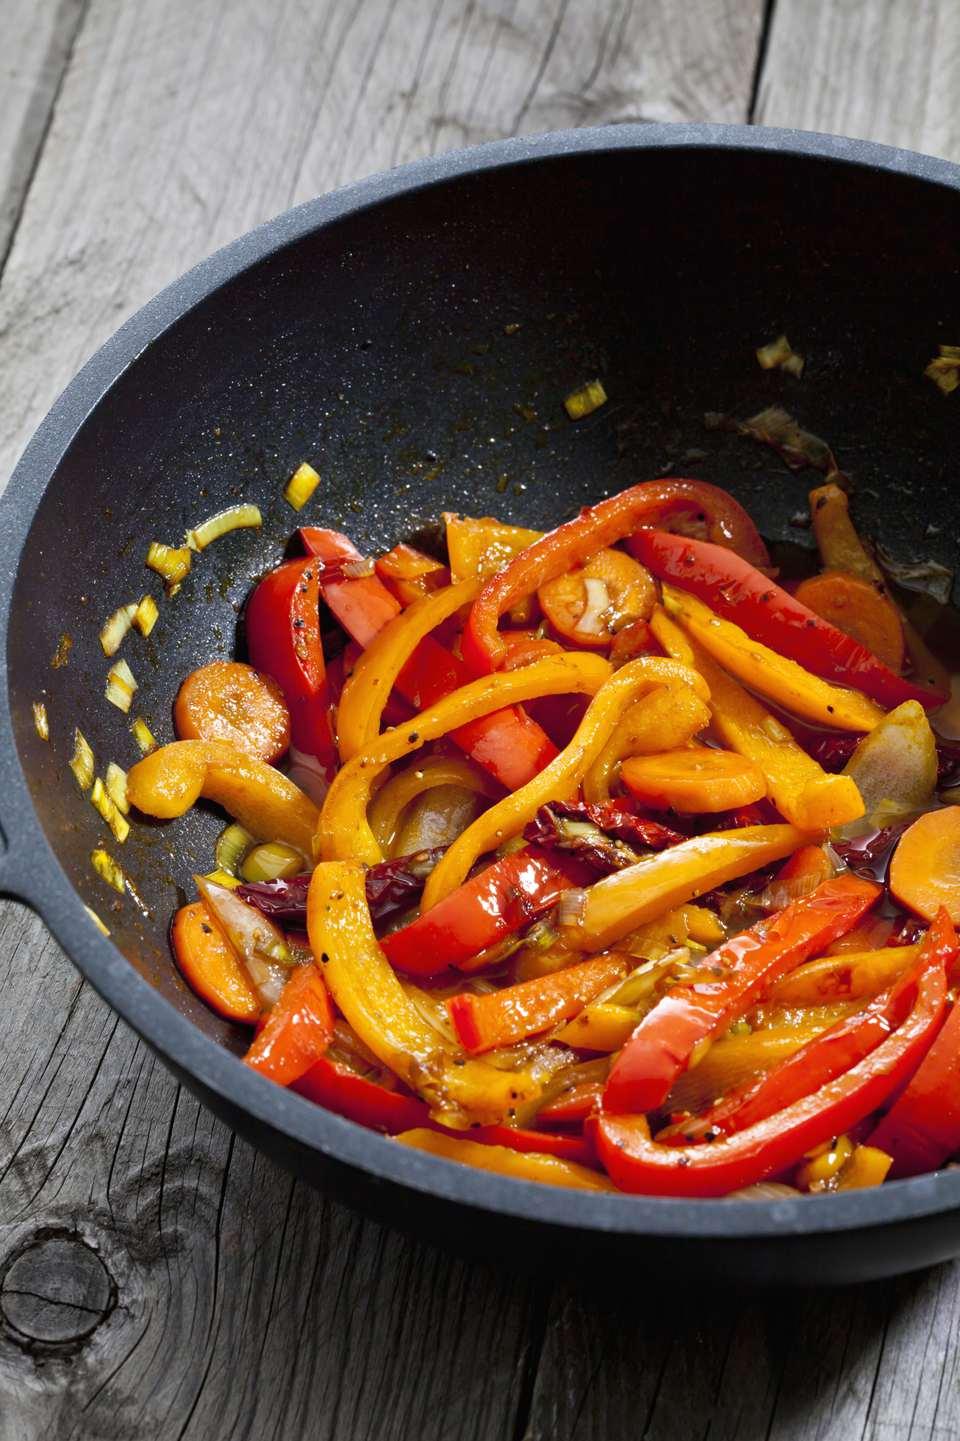 Cooking up some vegetarian bell pepper fajitas